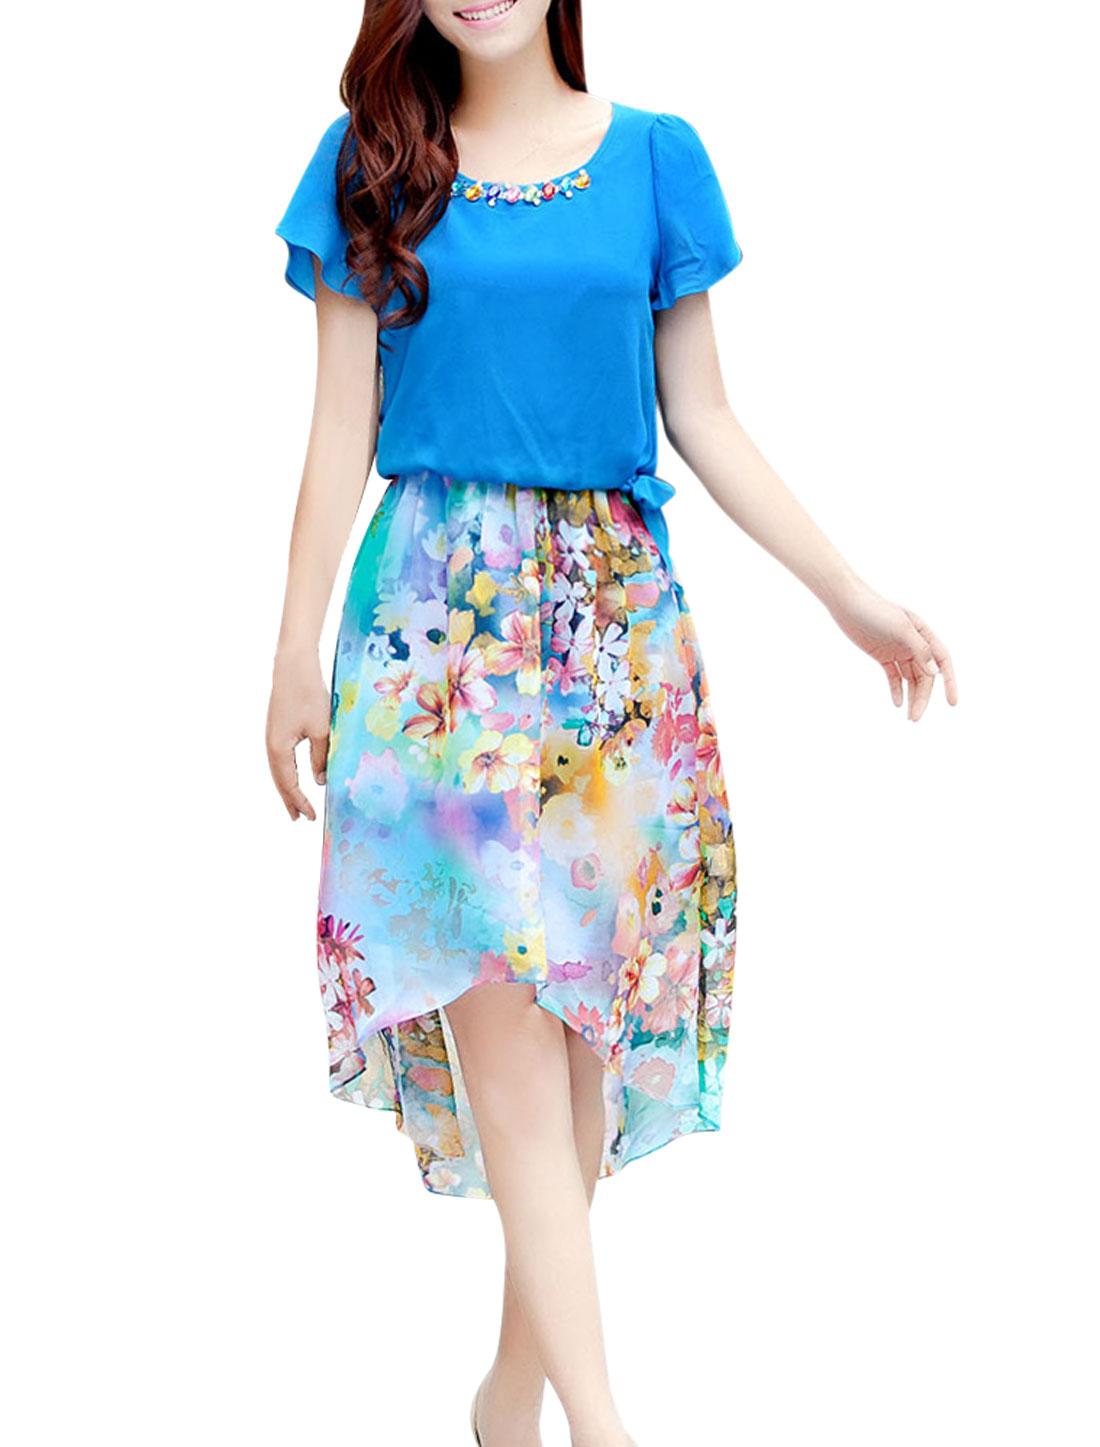 Lady Stretchy Waist Flower Pattern Semi-sheer Bondi Blue Dress XS